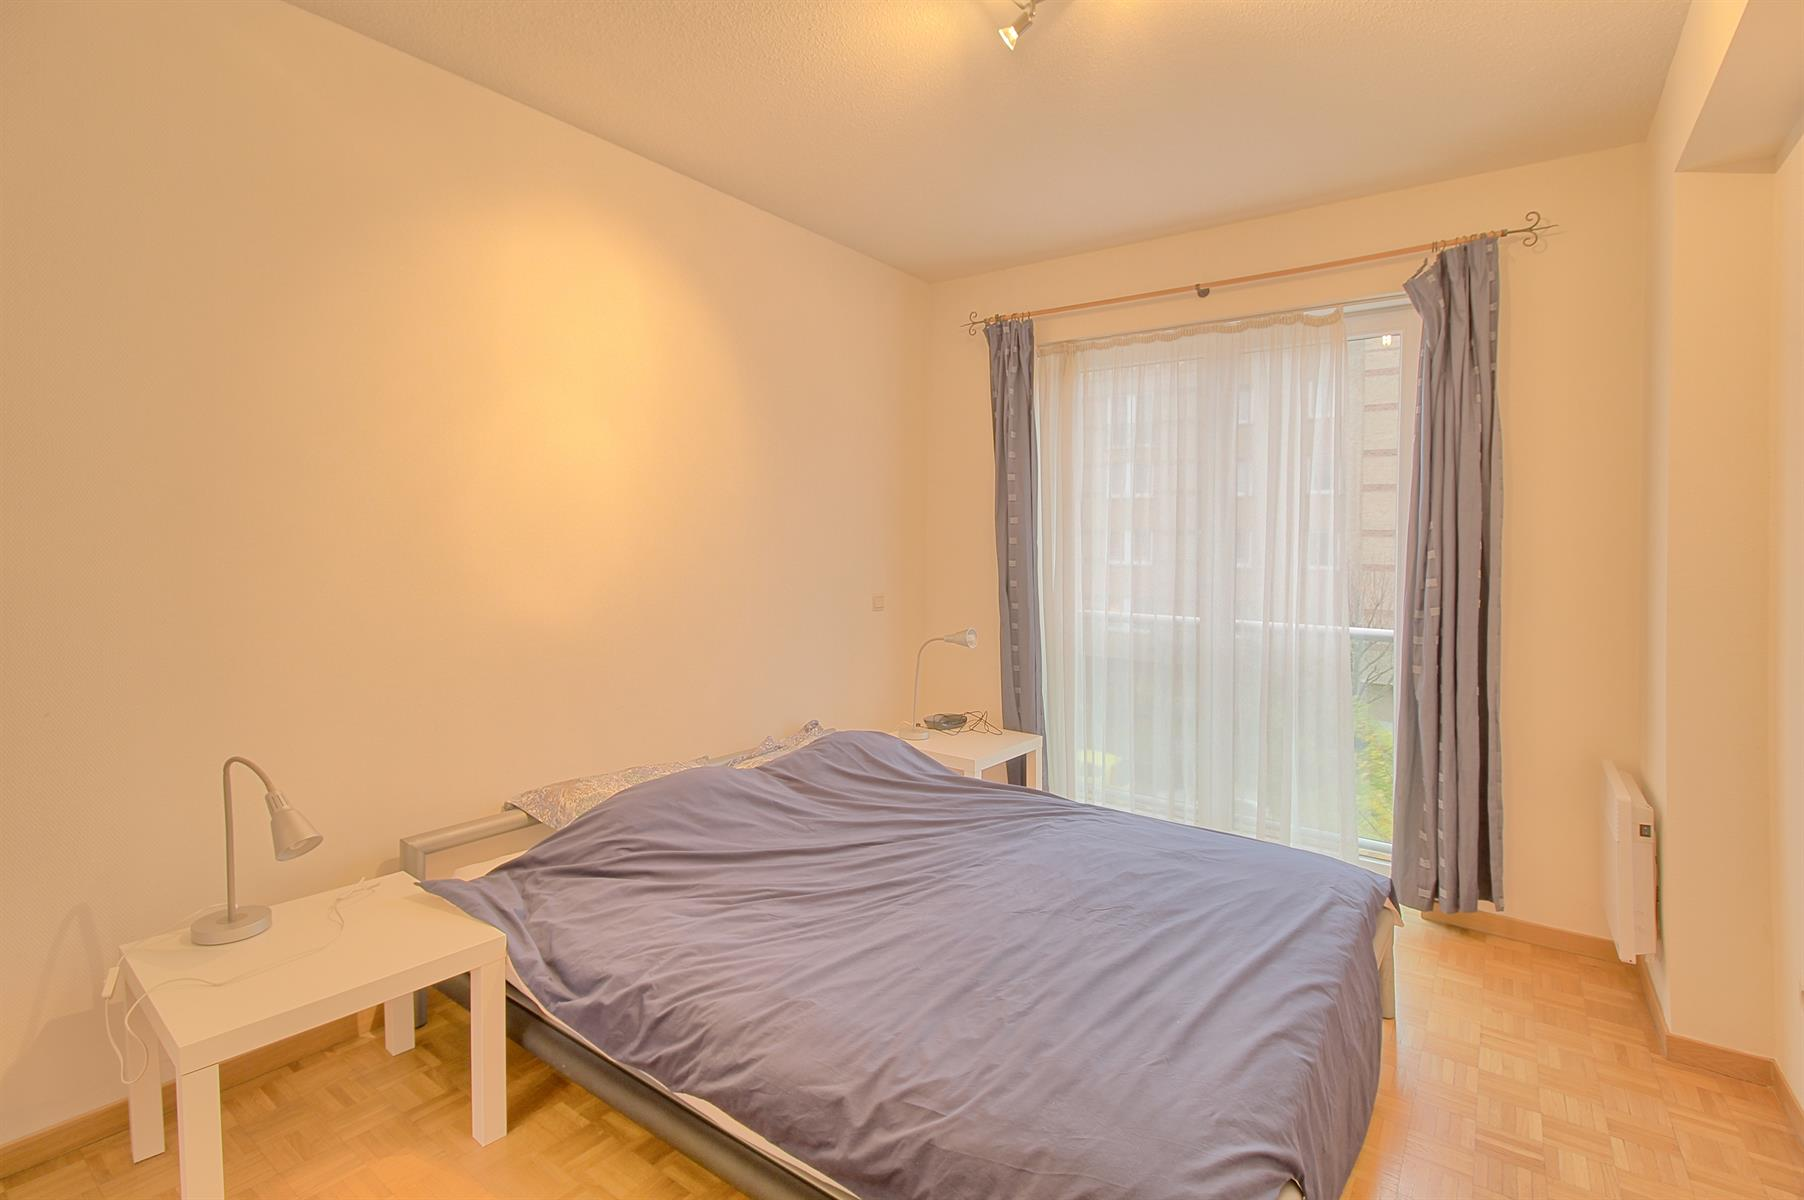 Appartement - Woluwe-Saint-Lambert - #4208881-4